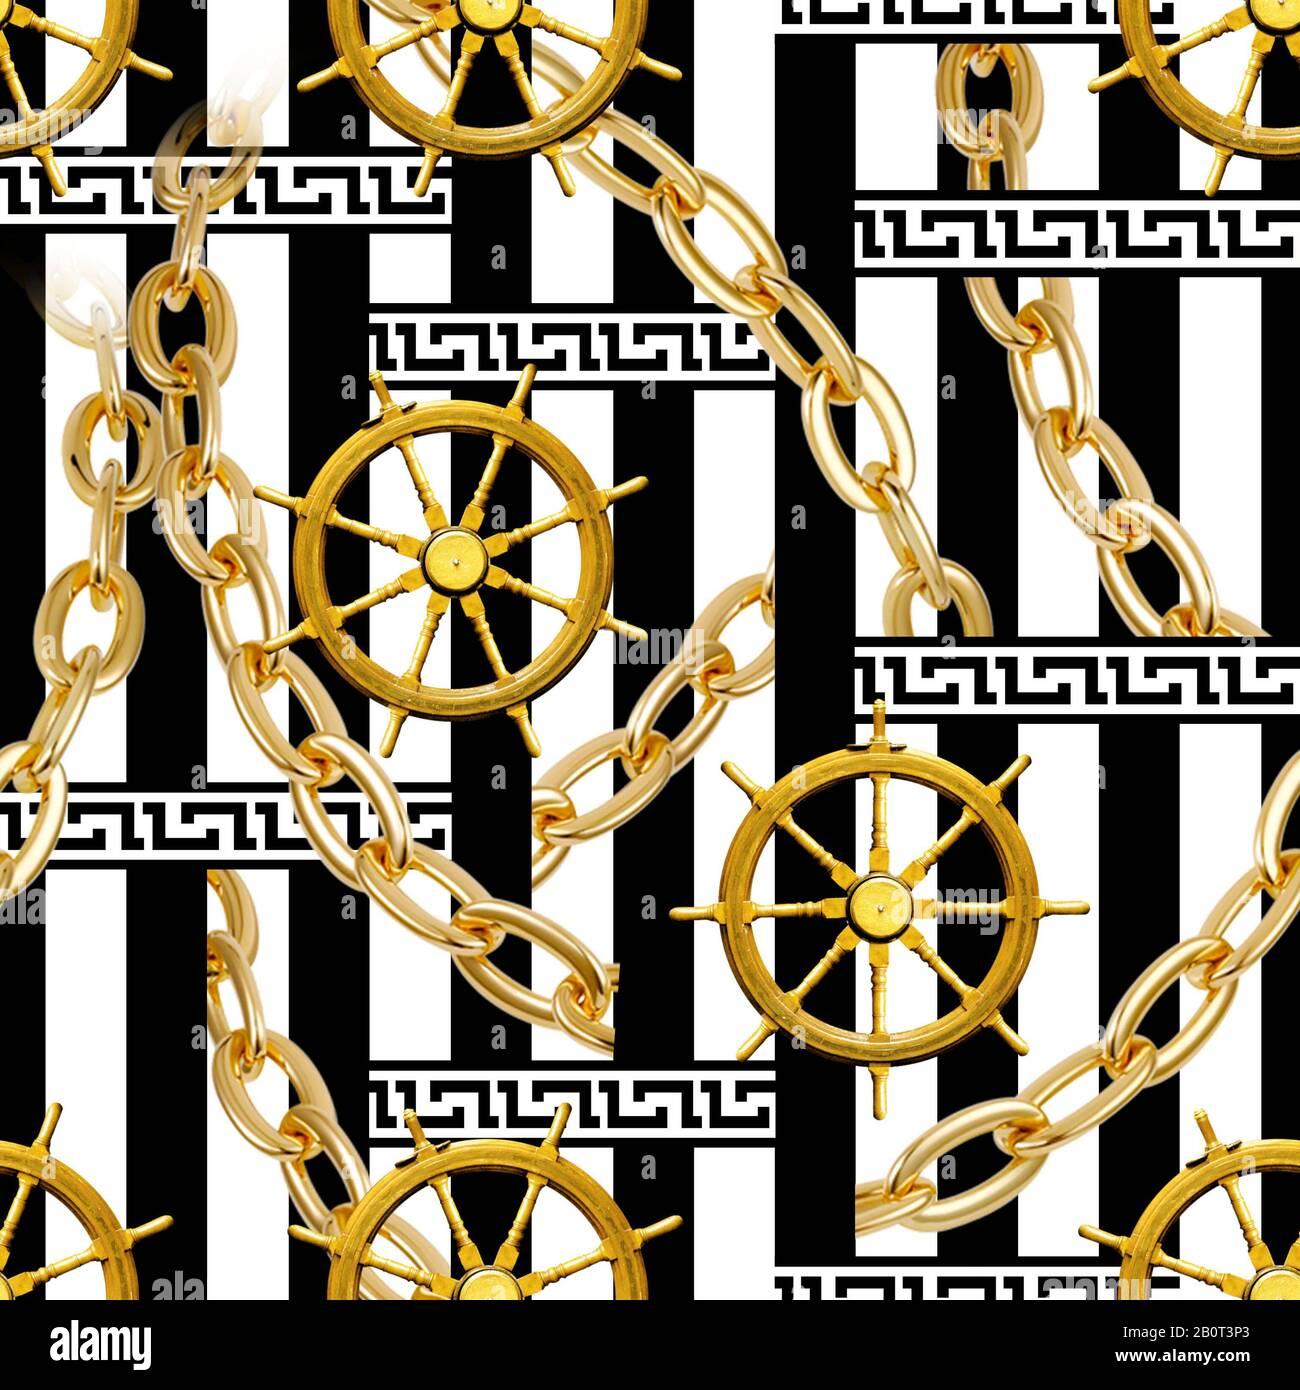 Seamless Rudder Gold Chains Border Pattern On Black White Stripes Background Illustration Stock Photo Alamy